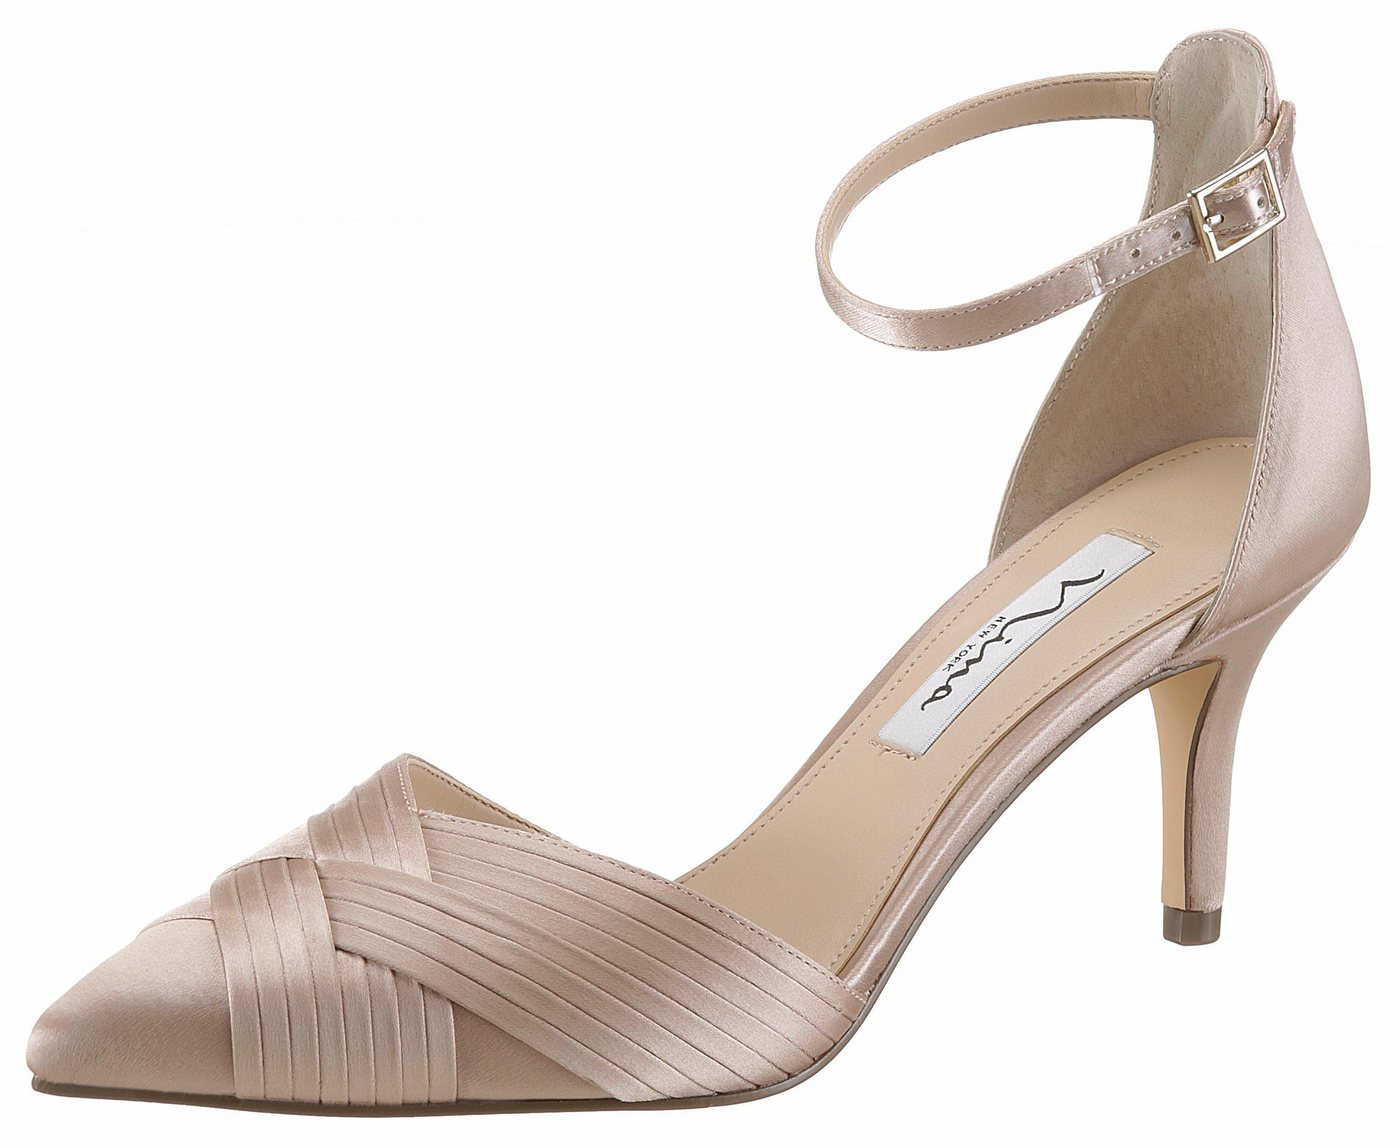 Nina »Teriann« Spangenpumps in spitzer Form | Schuhe > Pumps > Spangenpumps | Gelb | Nina